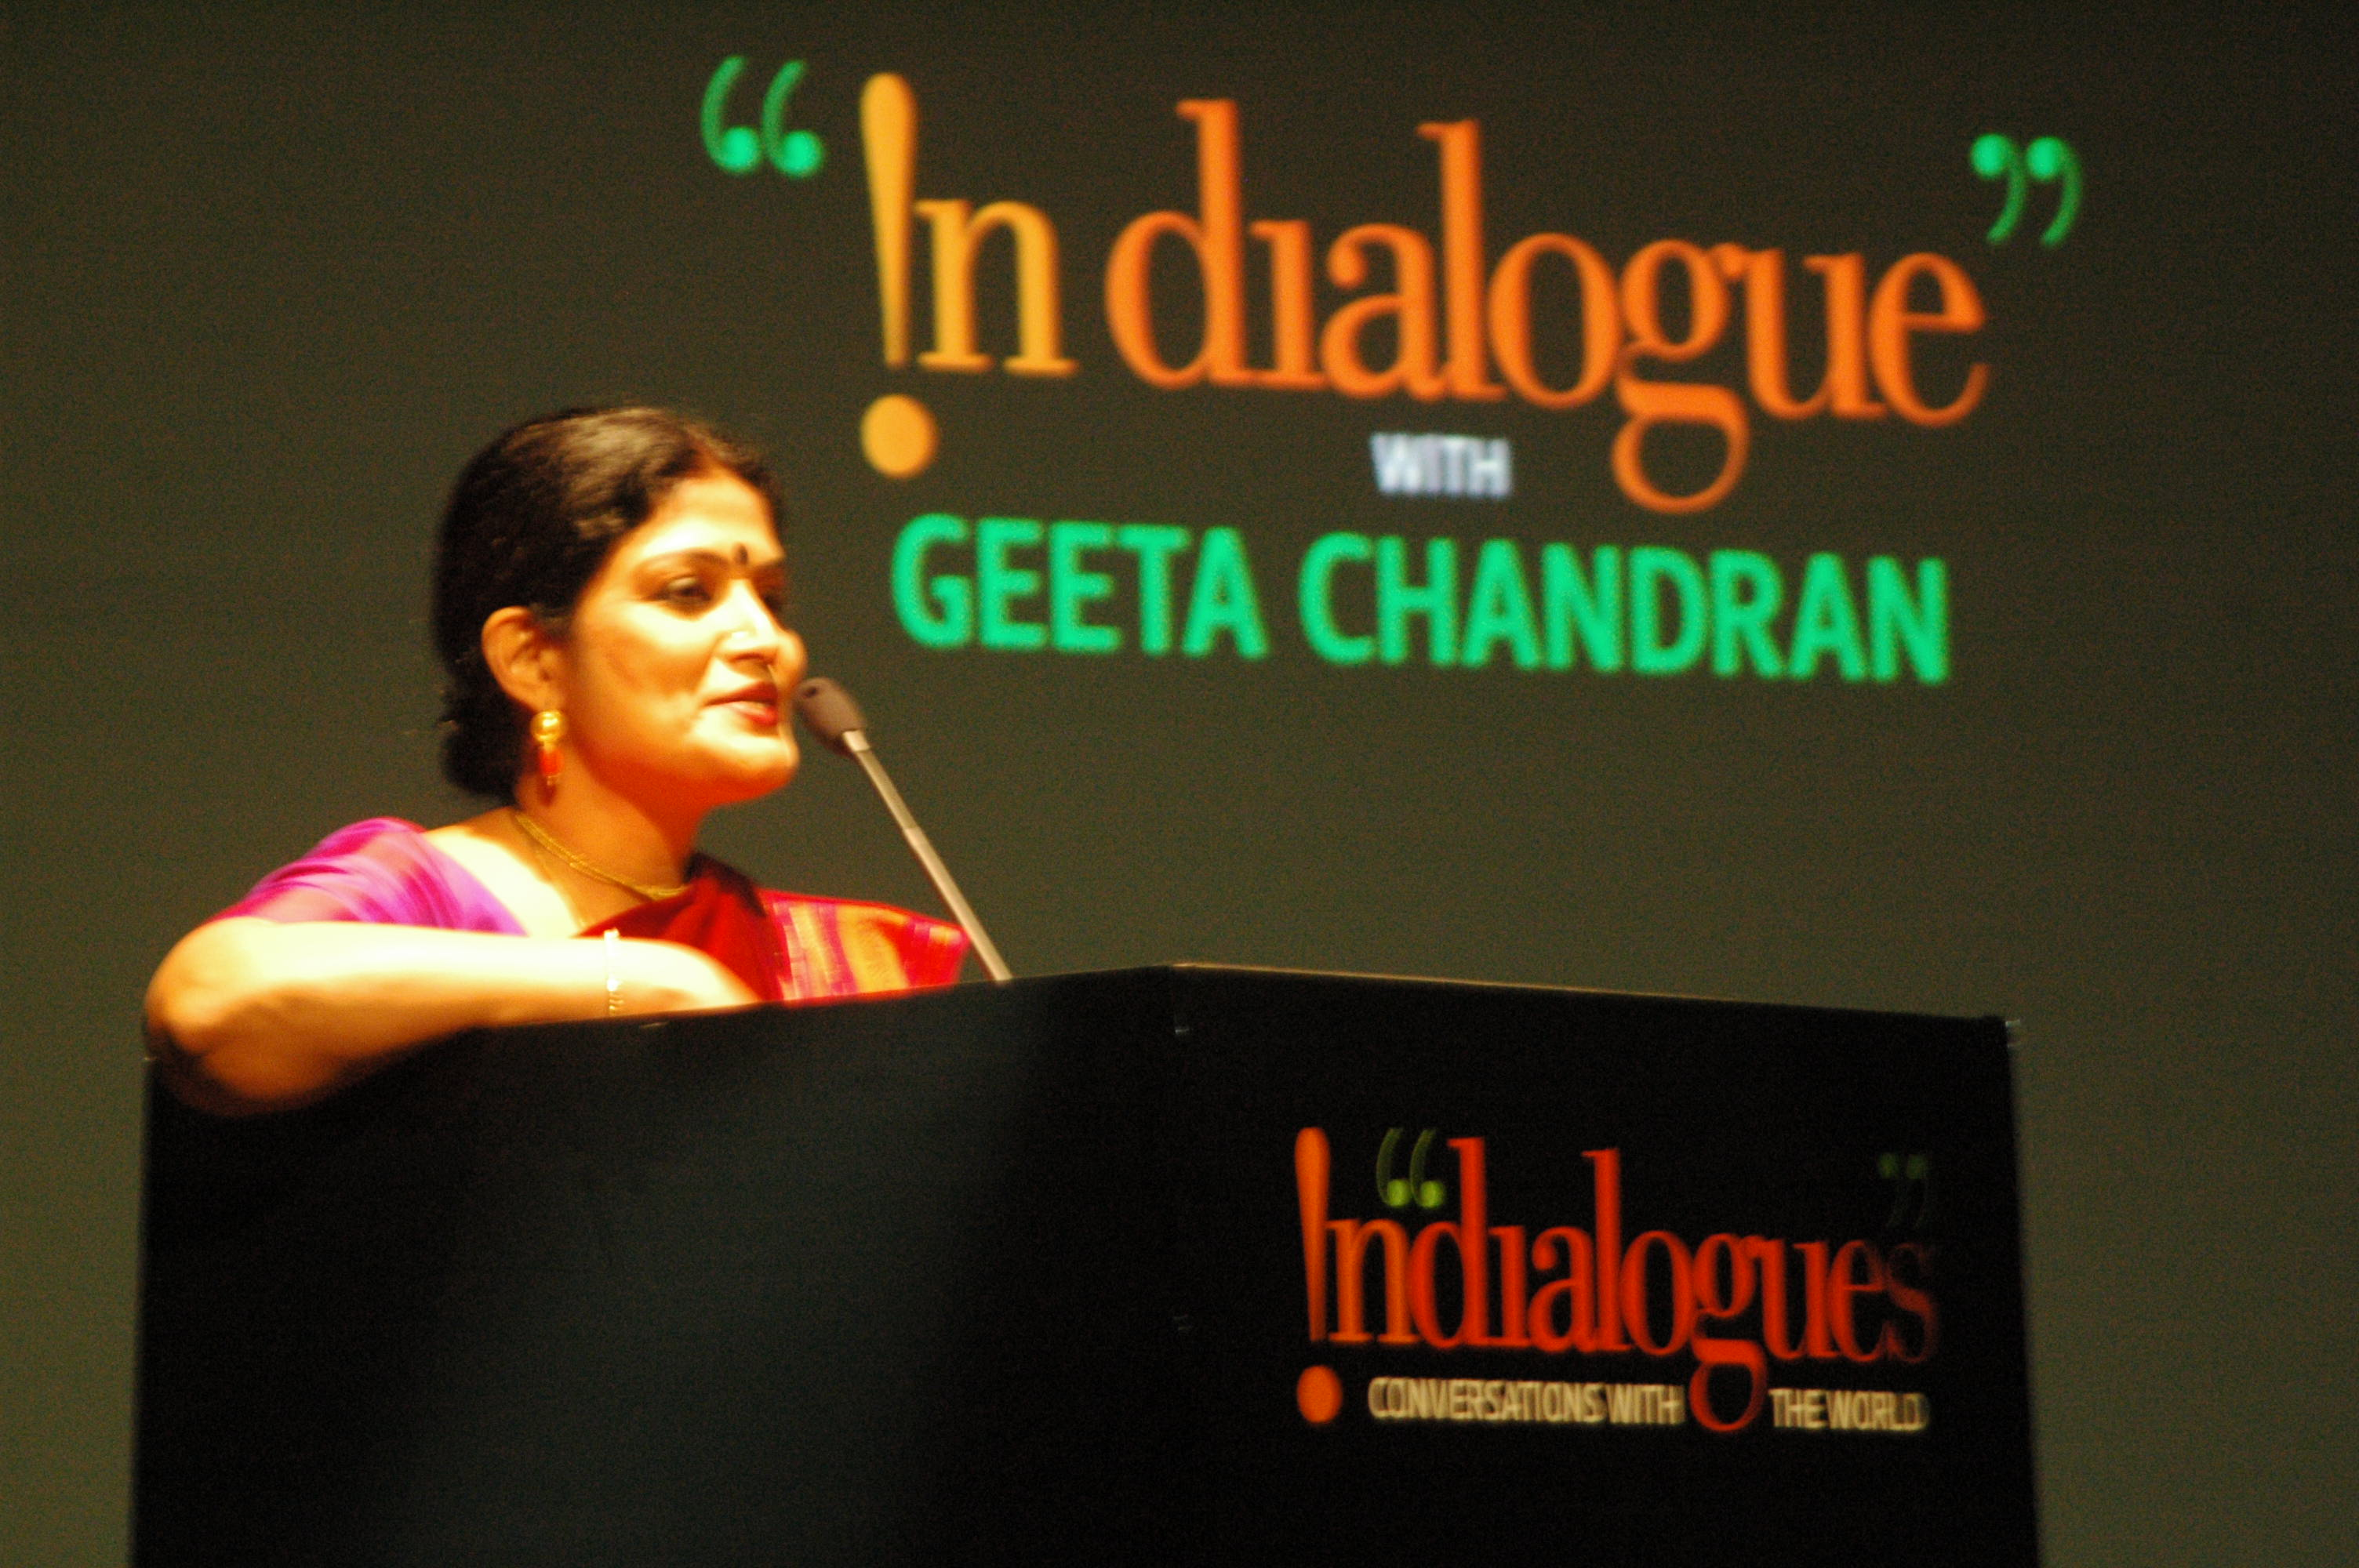 Padmashree Geeta Chandran, danseuse par excellence